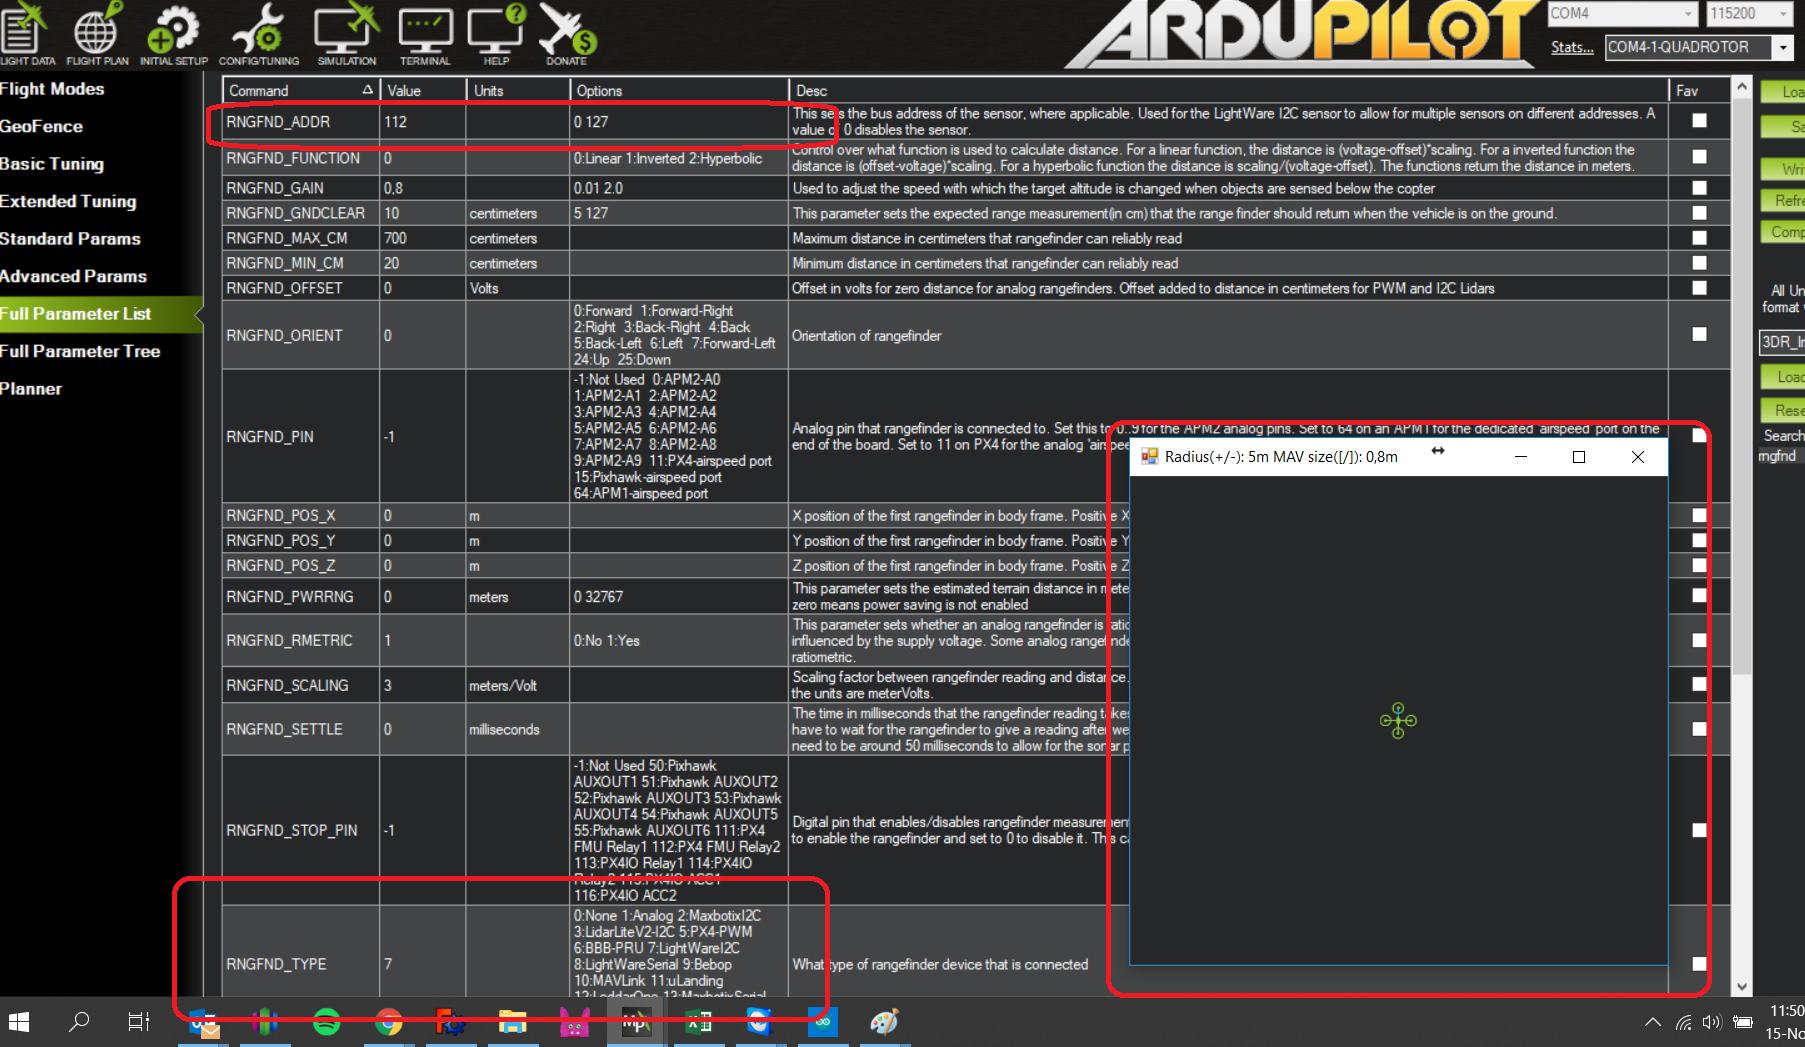 Multiple MaxBotix I2C Pixhawk 2 1 problem - Copter 3 6 - ArduPilot